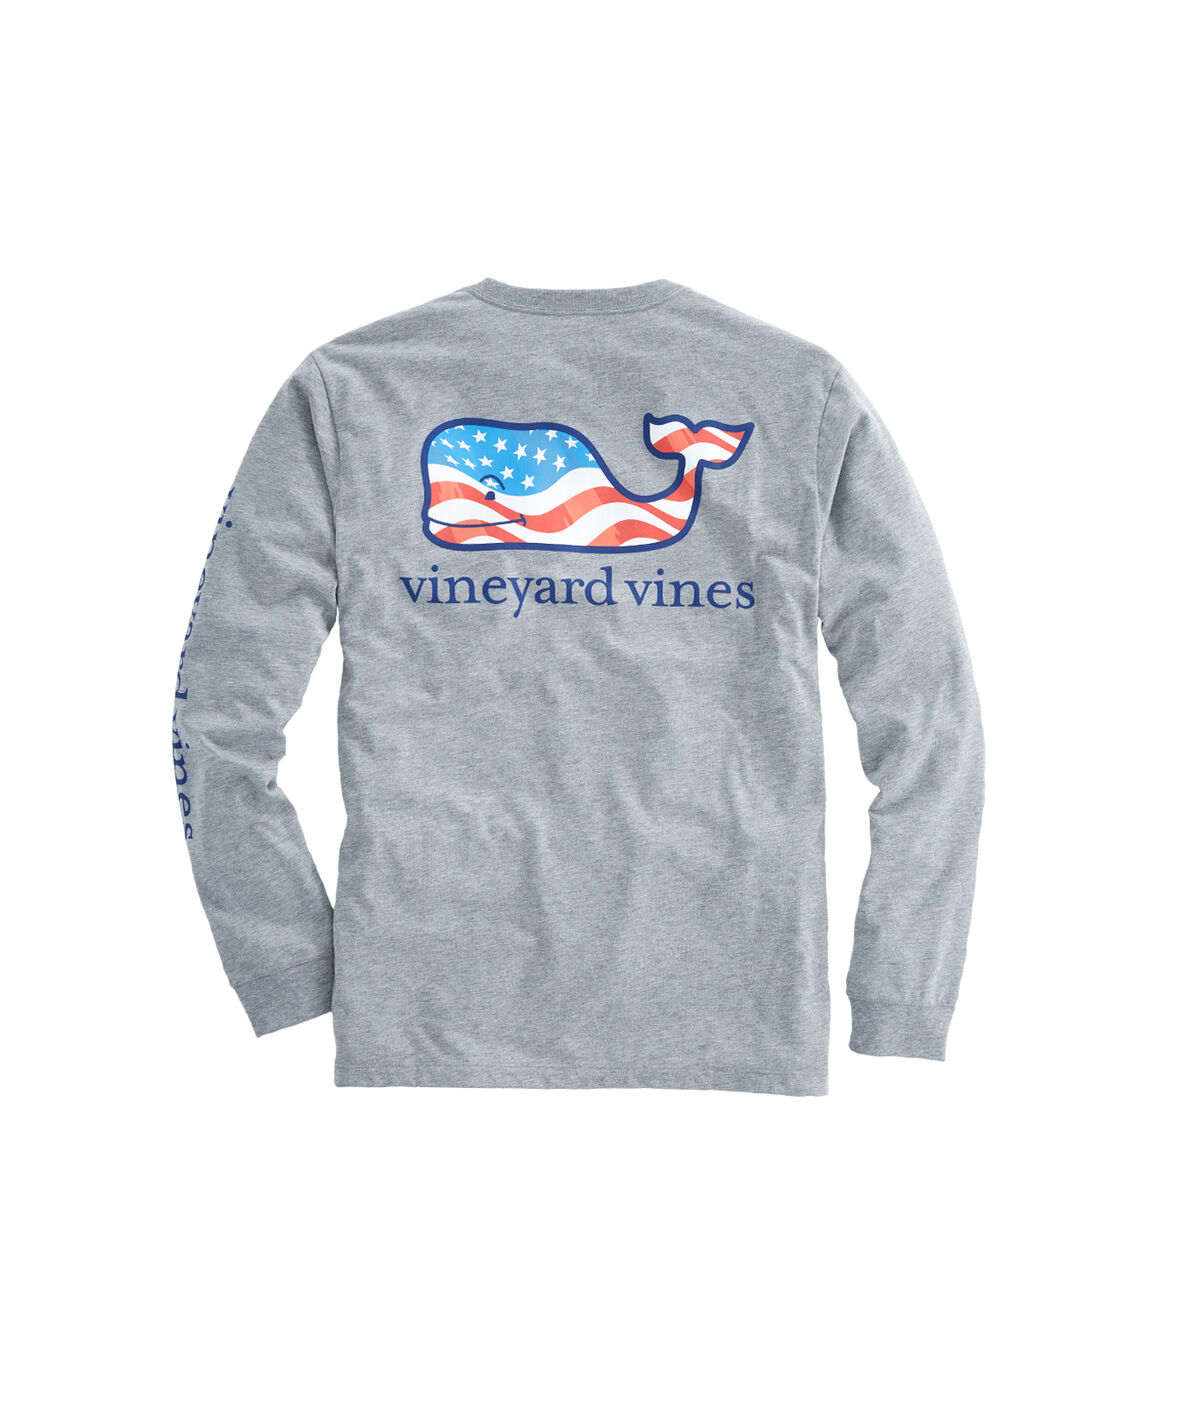 Black t shirt front and back plain - Long Sleeve Waving Flag Whale Fill Pocket T Shirt